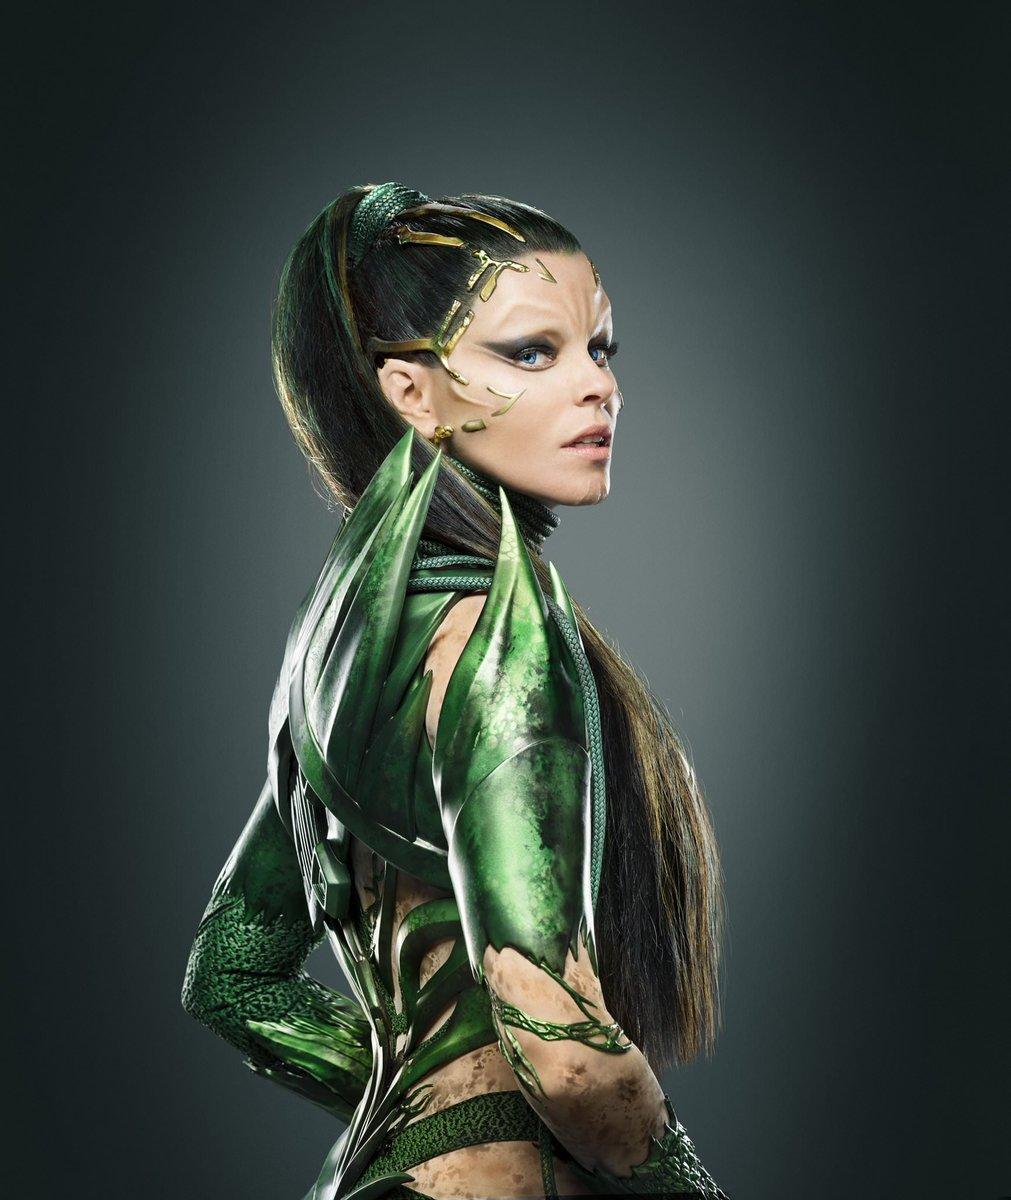 Rita Repulsa Photo from Power Rangers